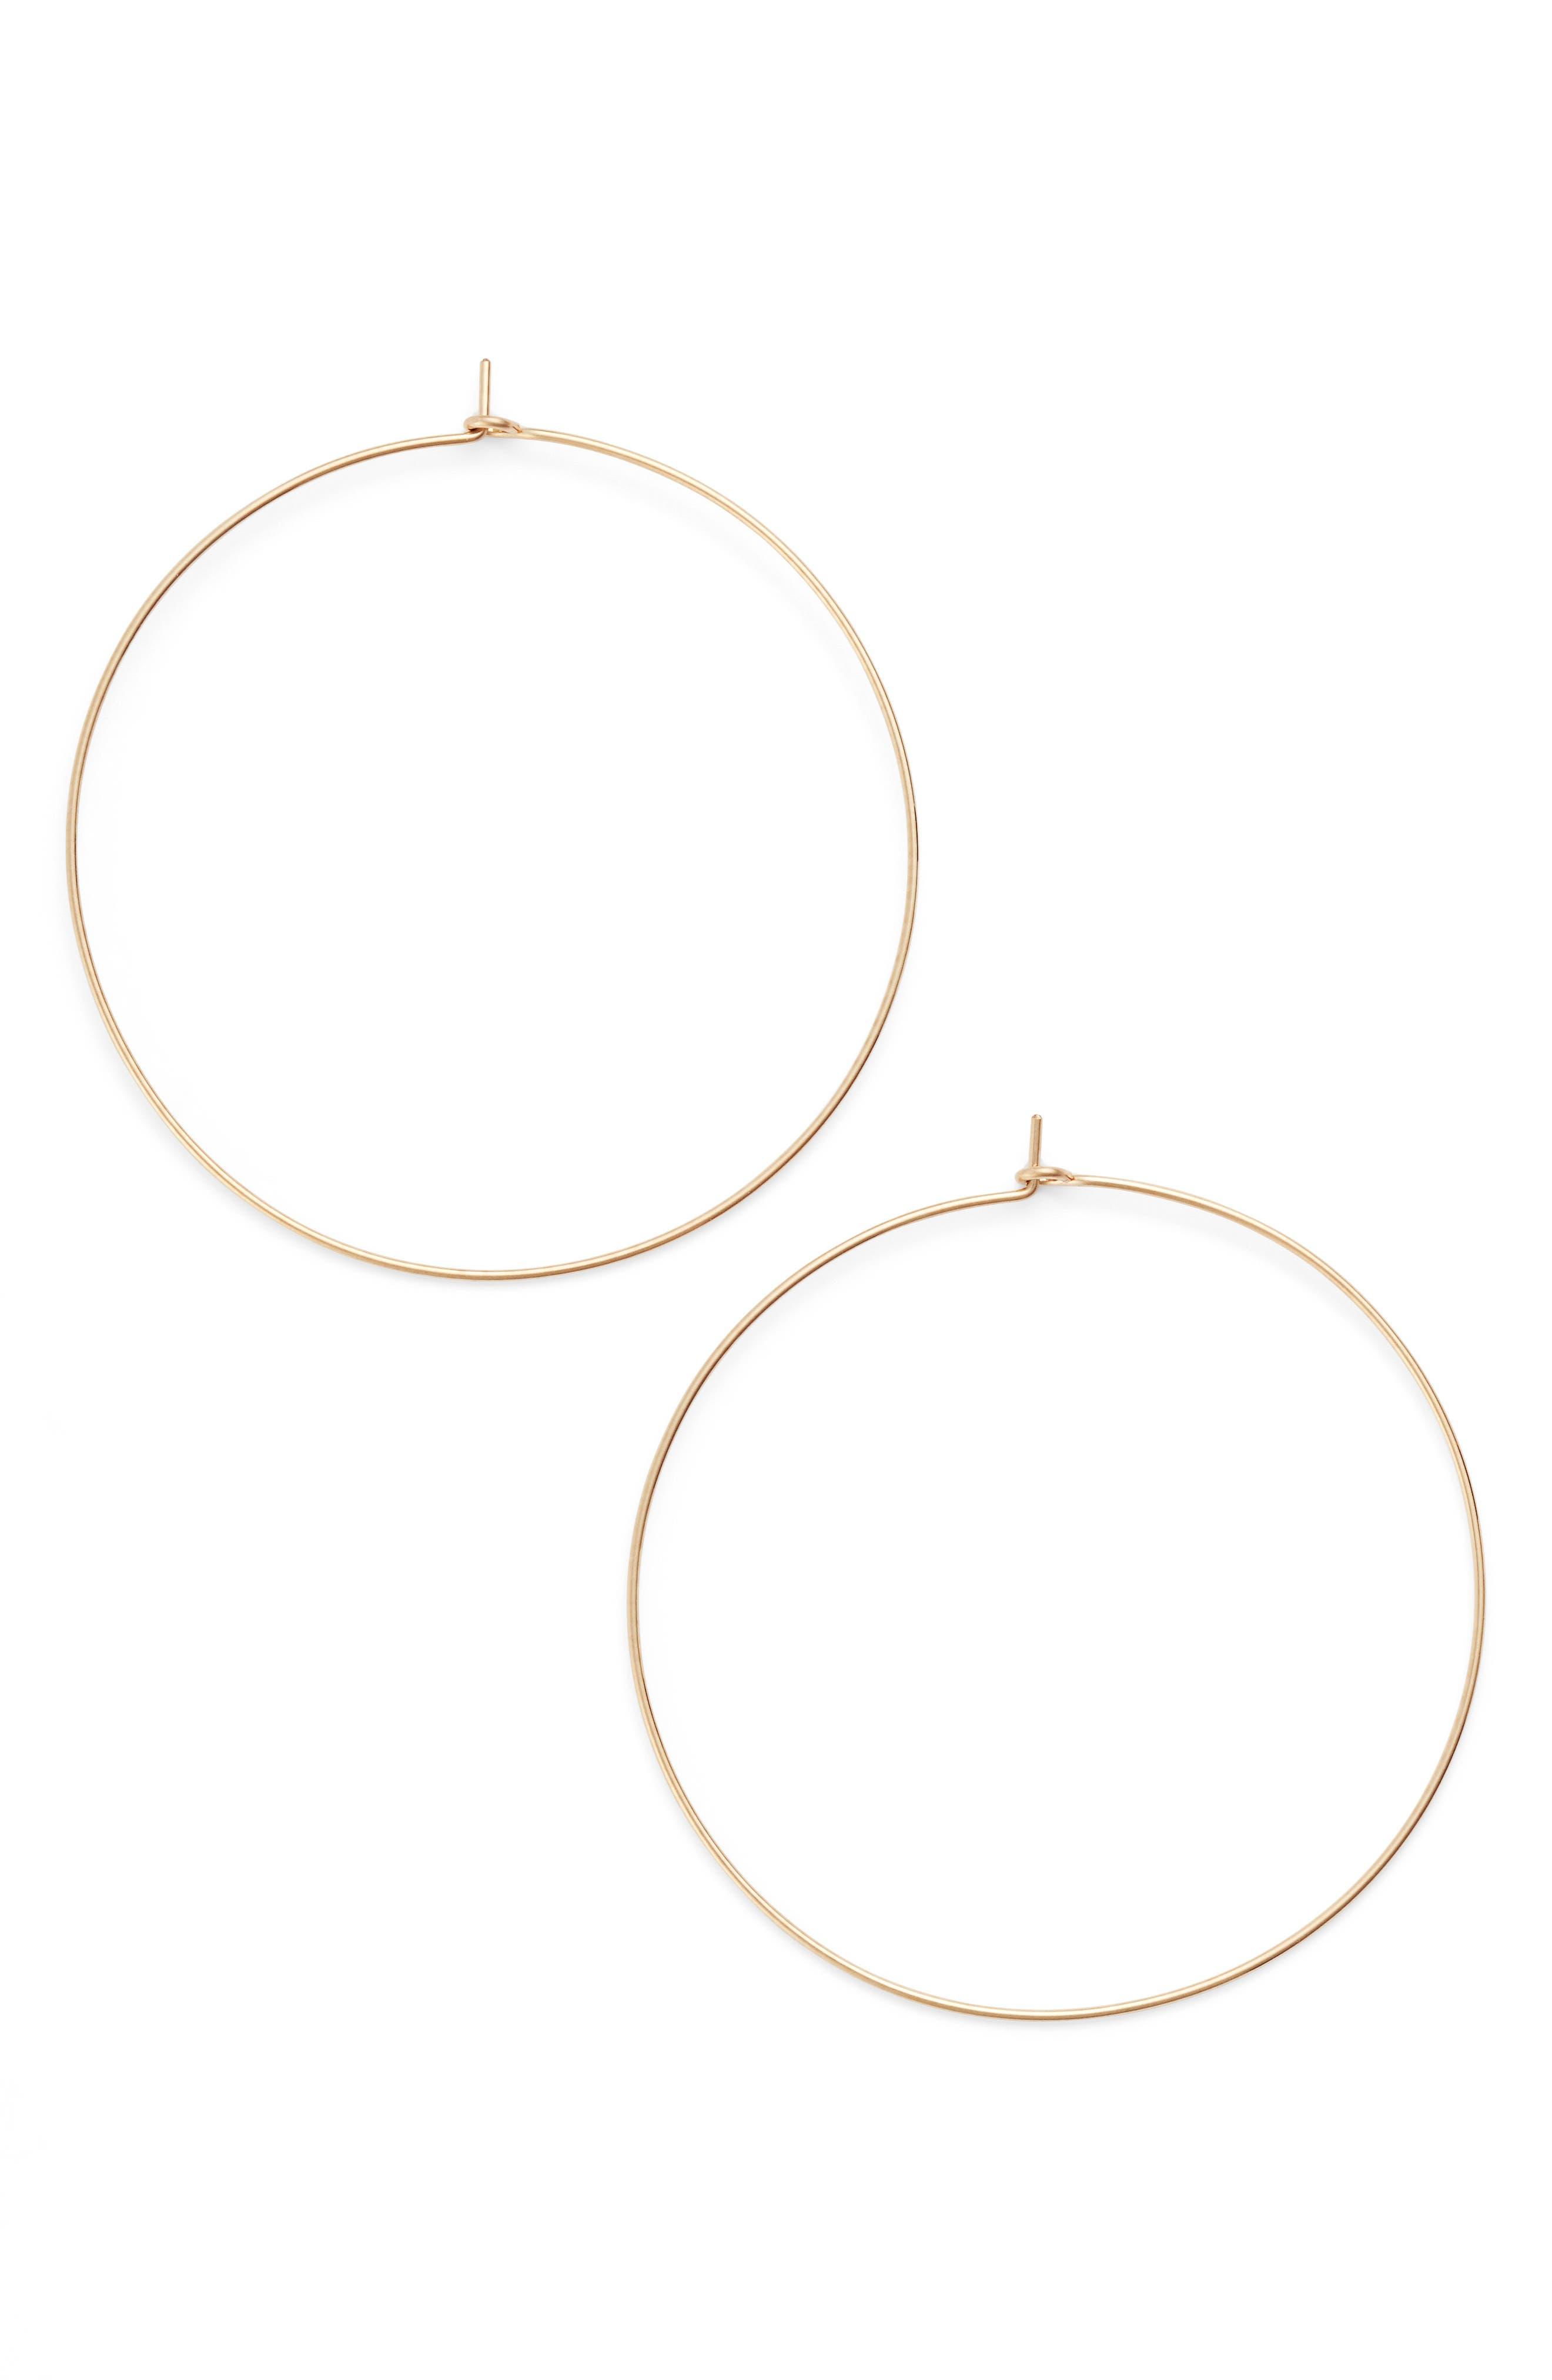 Alternate Image 1 Selected - Nashelle Extra Large Hoop Earrings